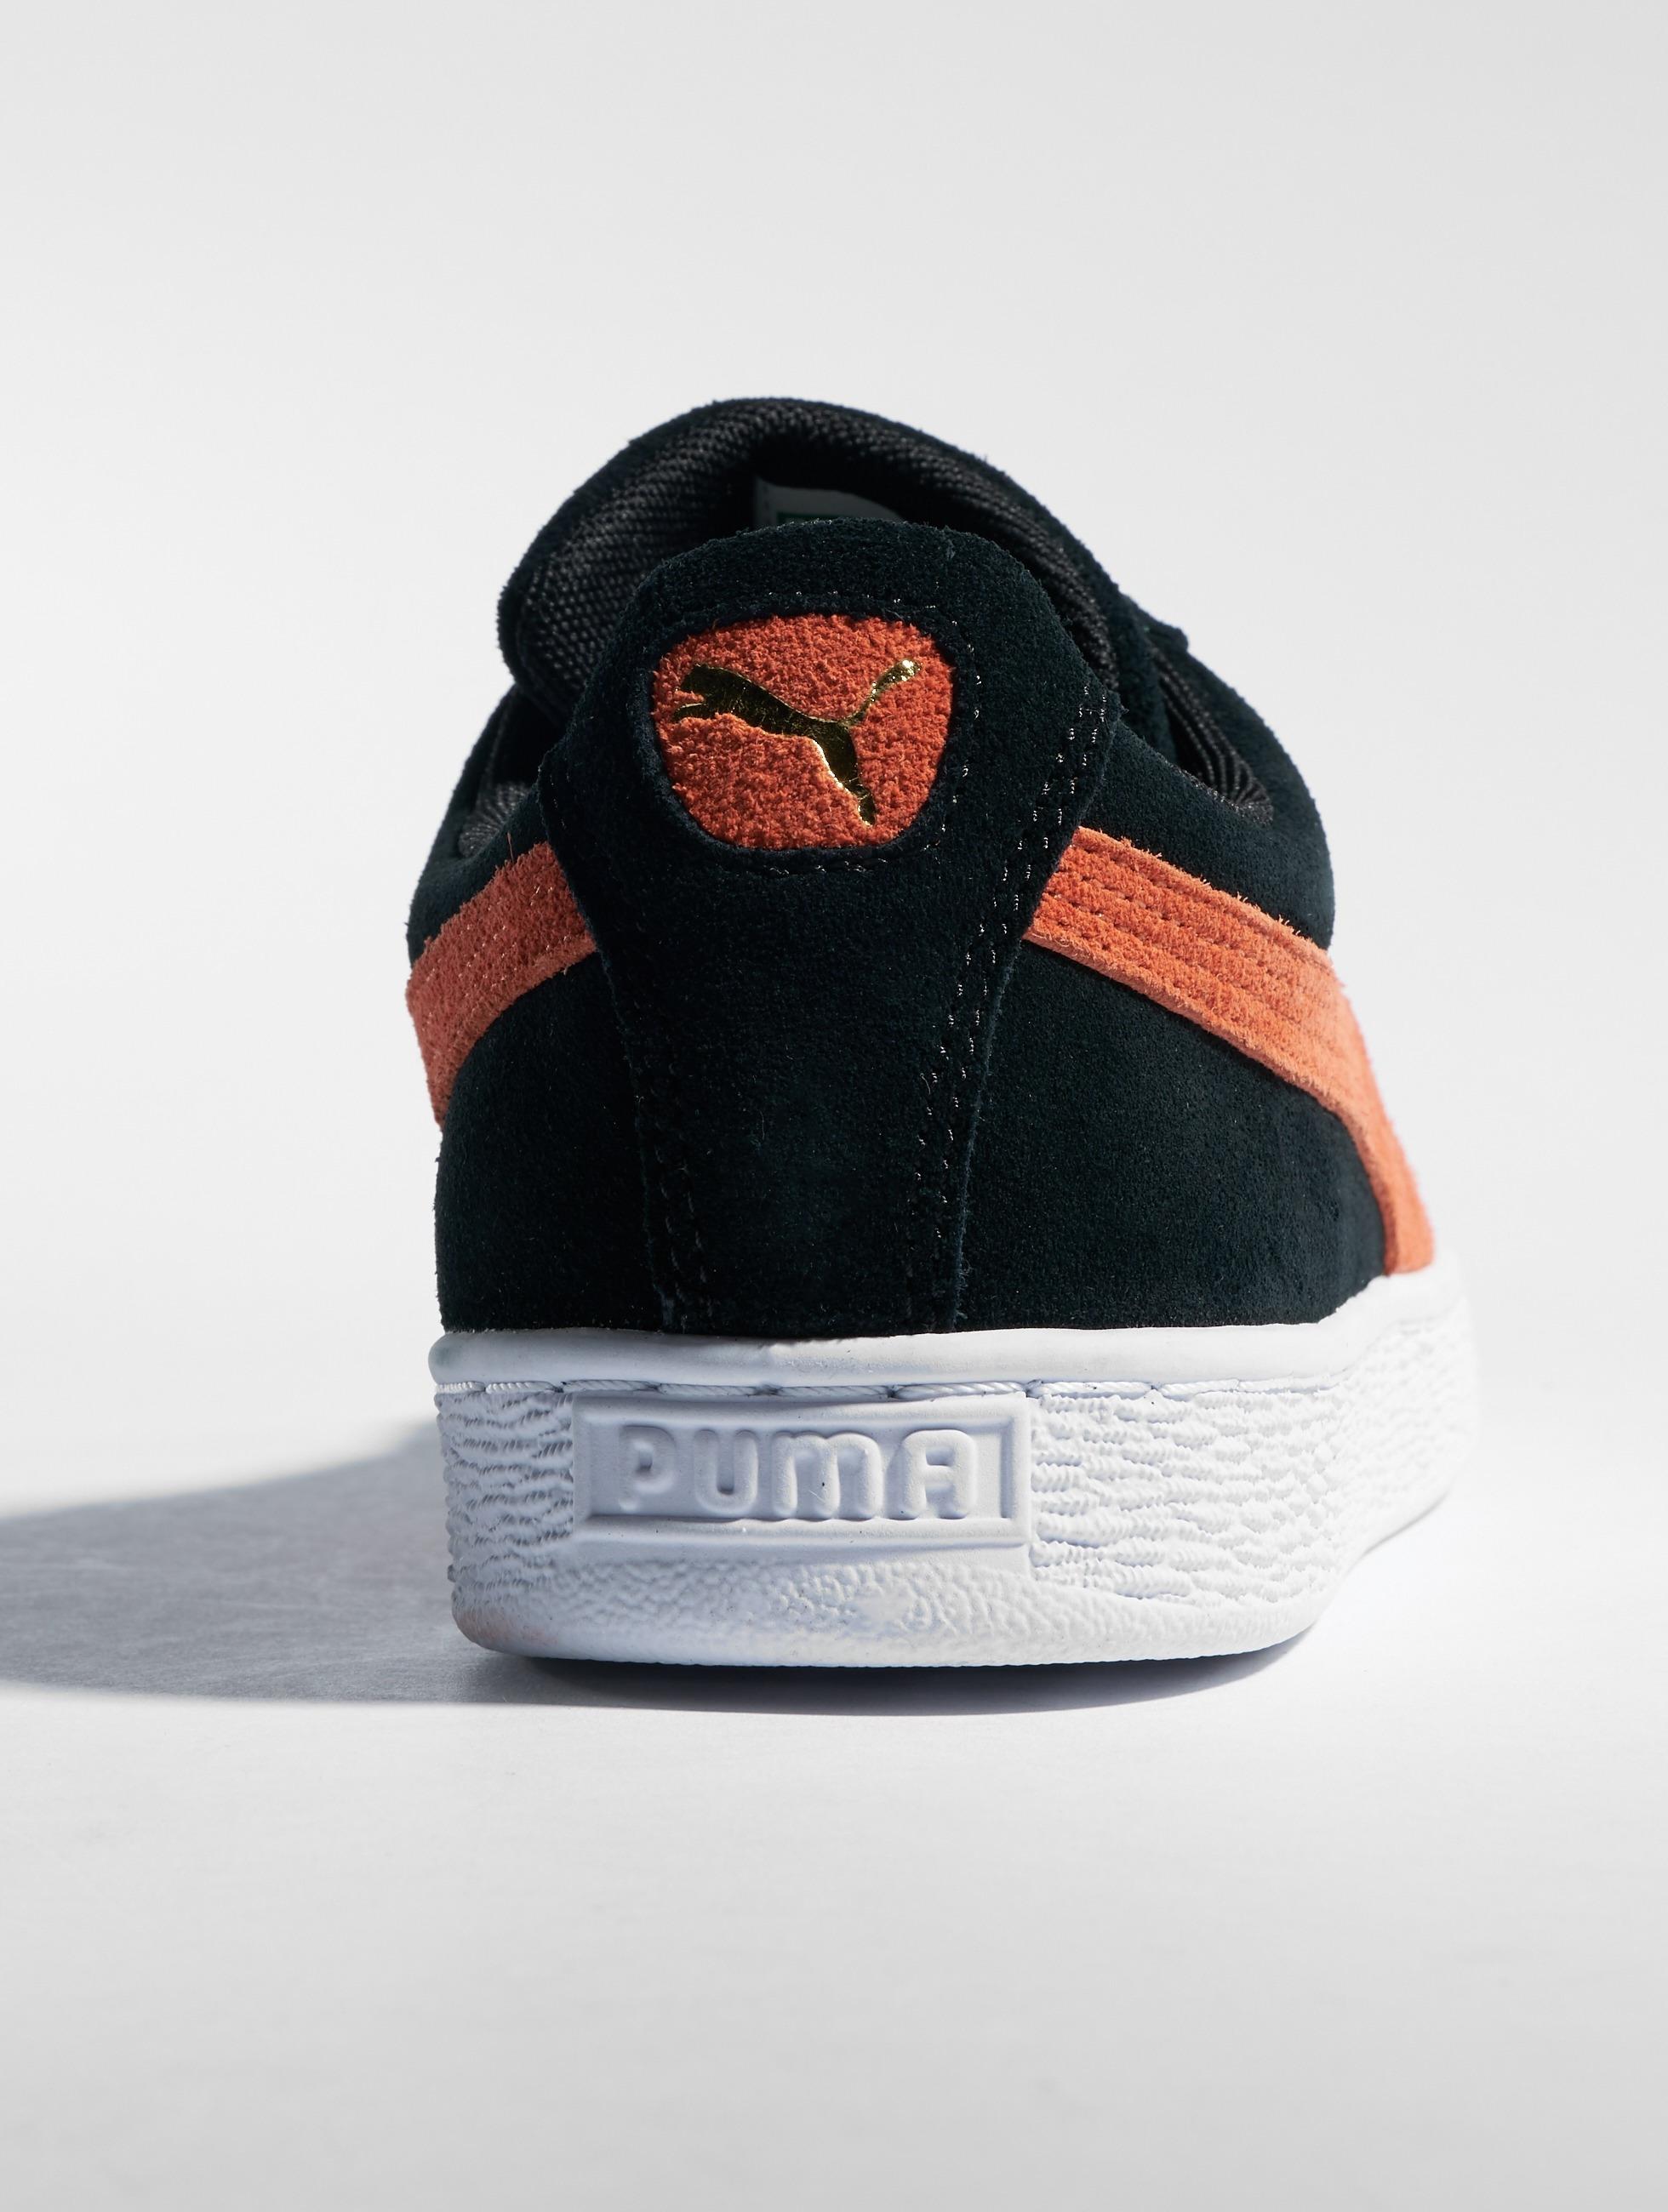 the best attitude 5a19f f8e96 ... Puma Homme Chaussures   Baskets Suede Classic Classic Classic f83e8e